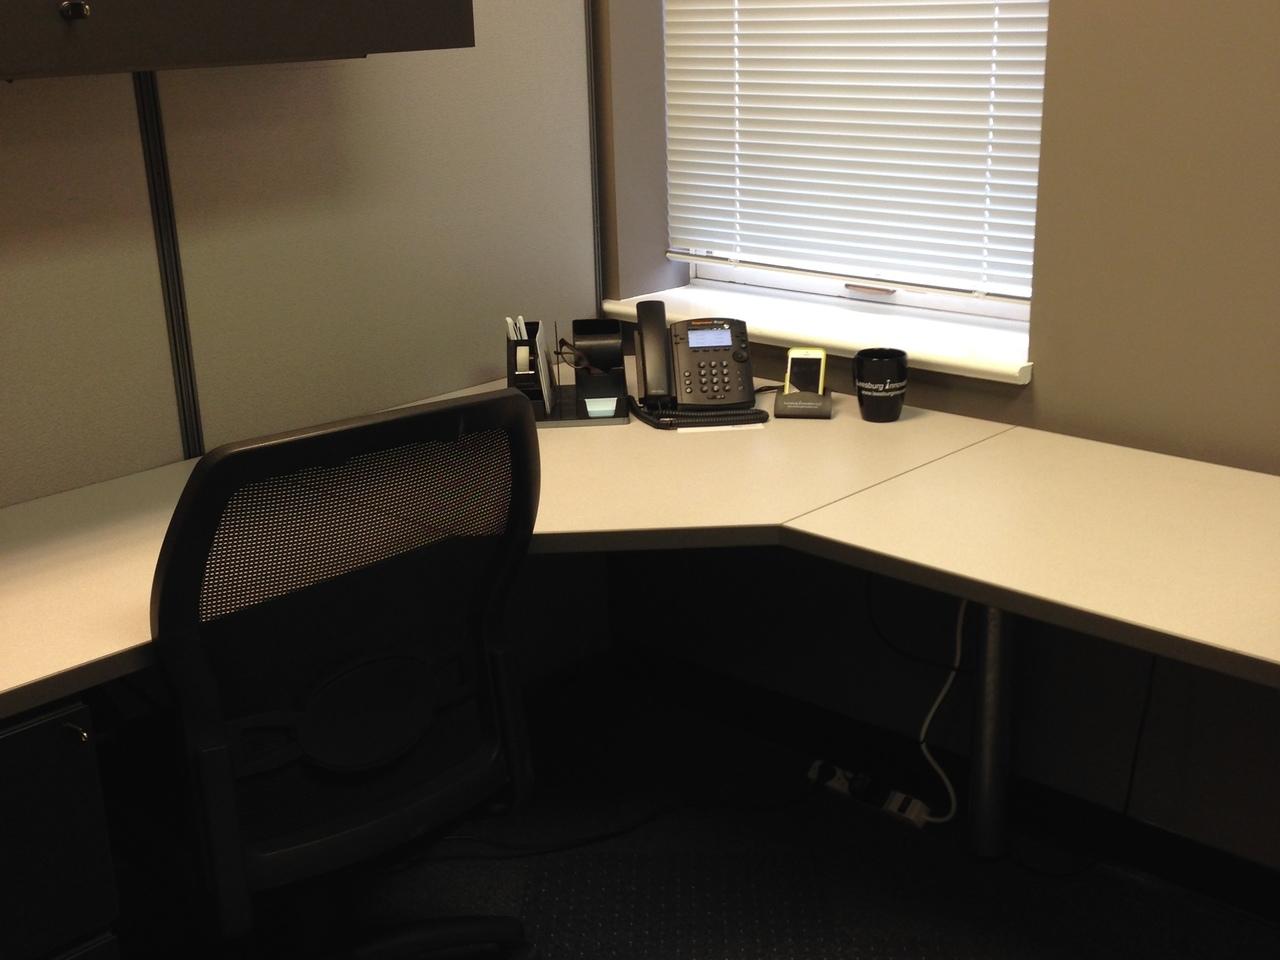 Shared Desk Office Space Private Office Hub Zone Washington DC - Washington dc hubzone map